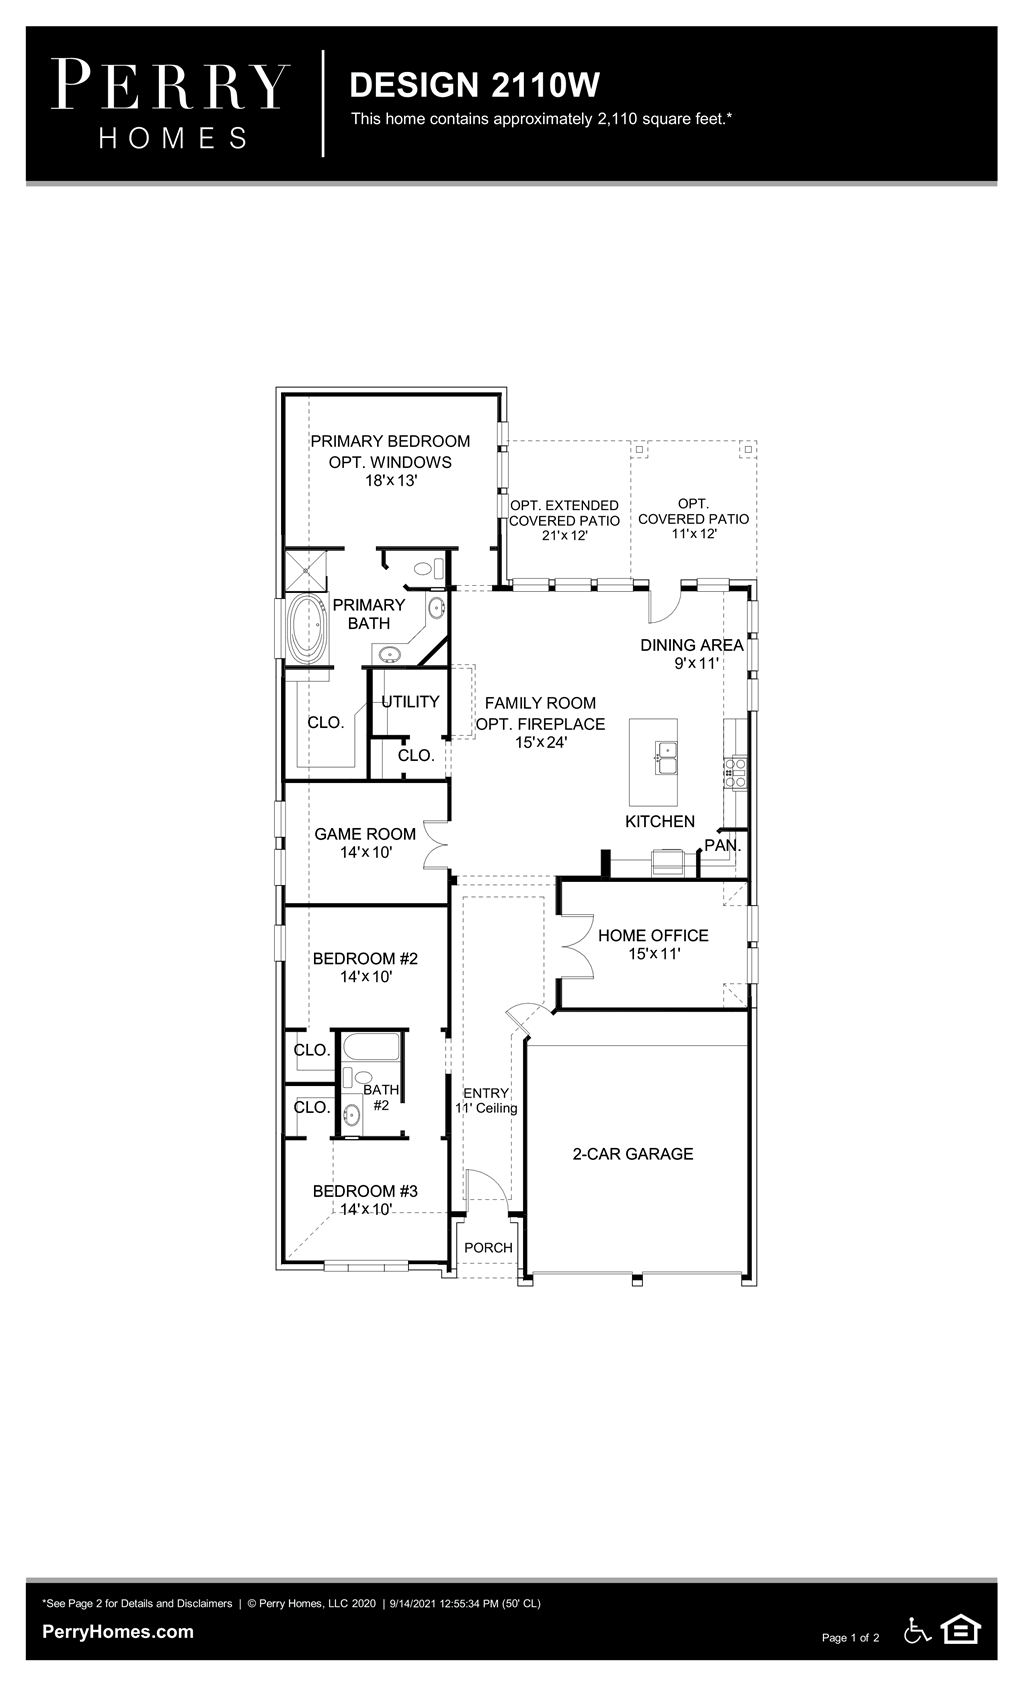 Floor Plan for 2110W